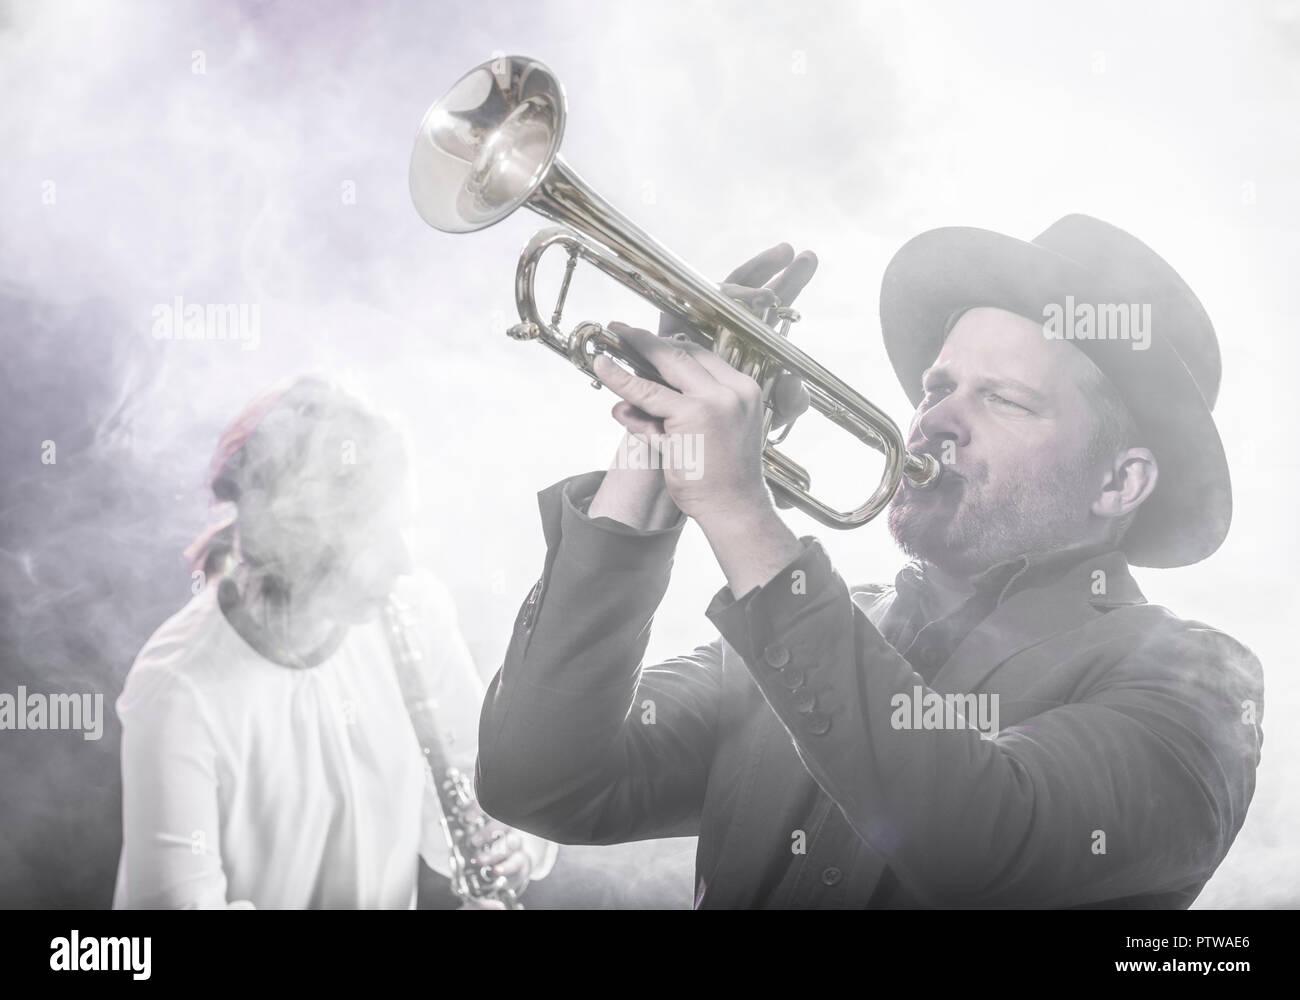 Musiker Mit Trompete, Musikerin Mit Klarinette (Model-Release) Stockbild